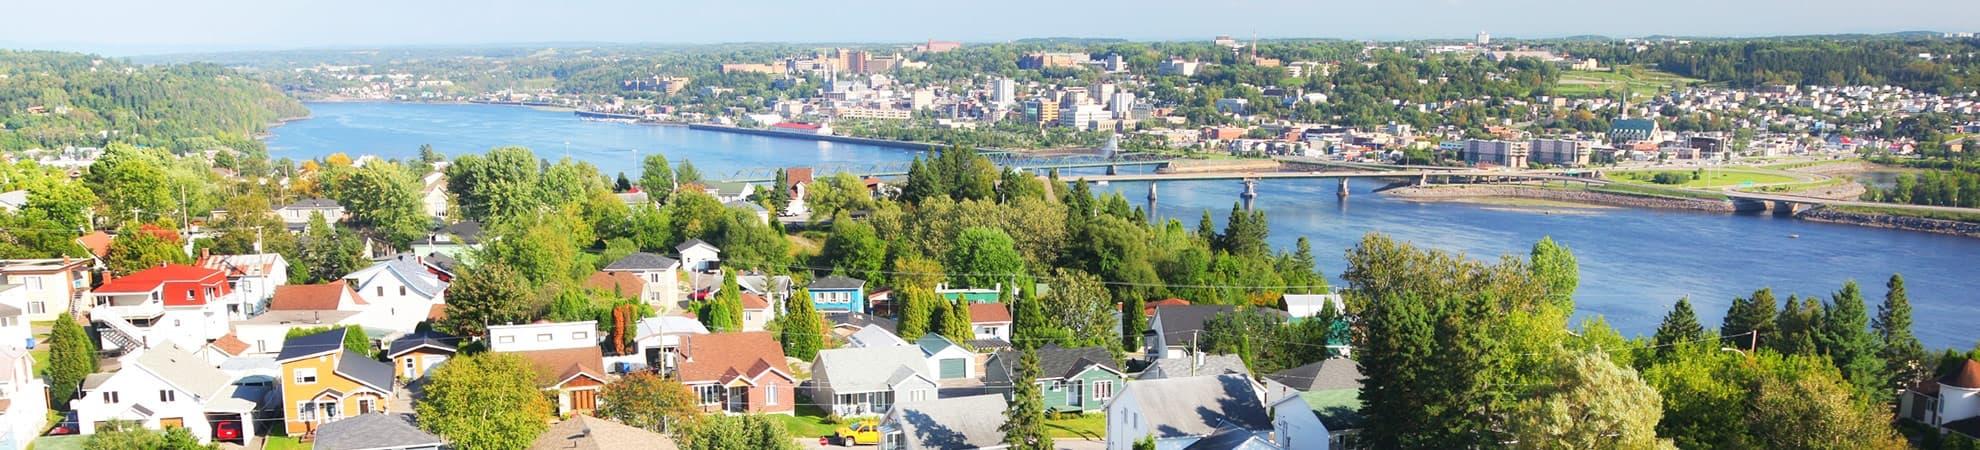 Voyage Saguenay